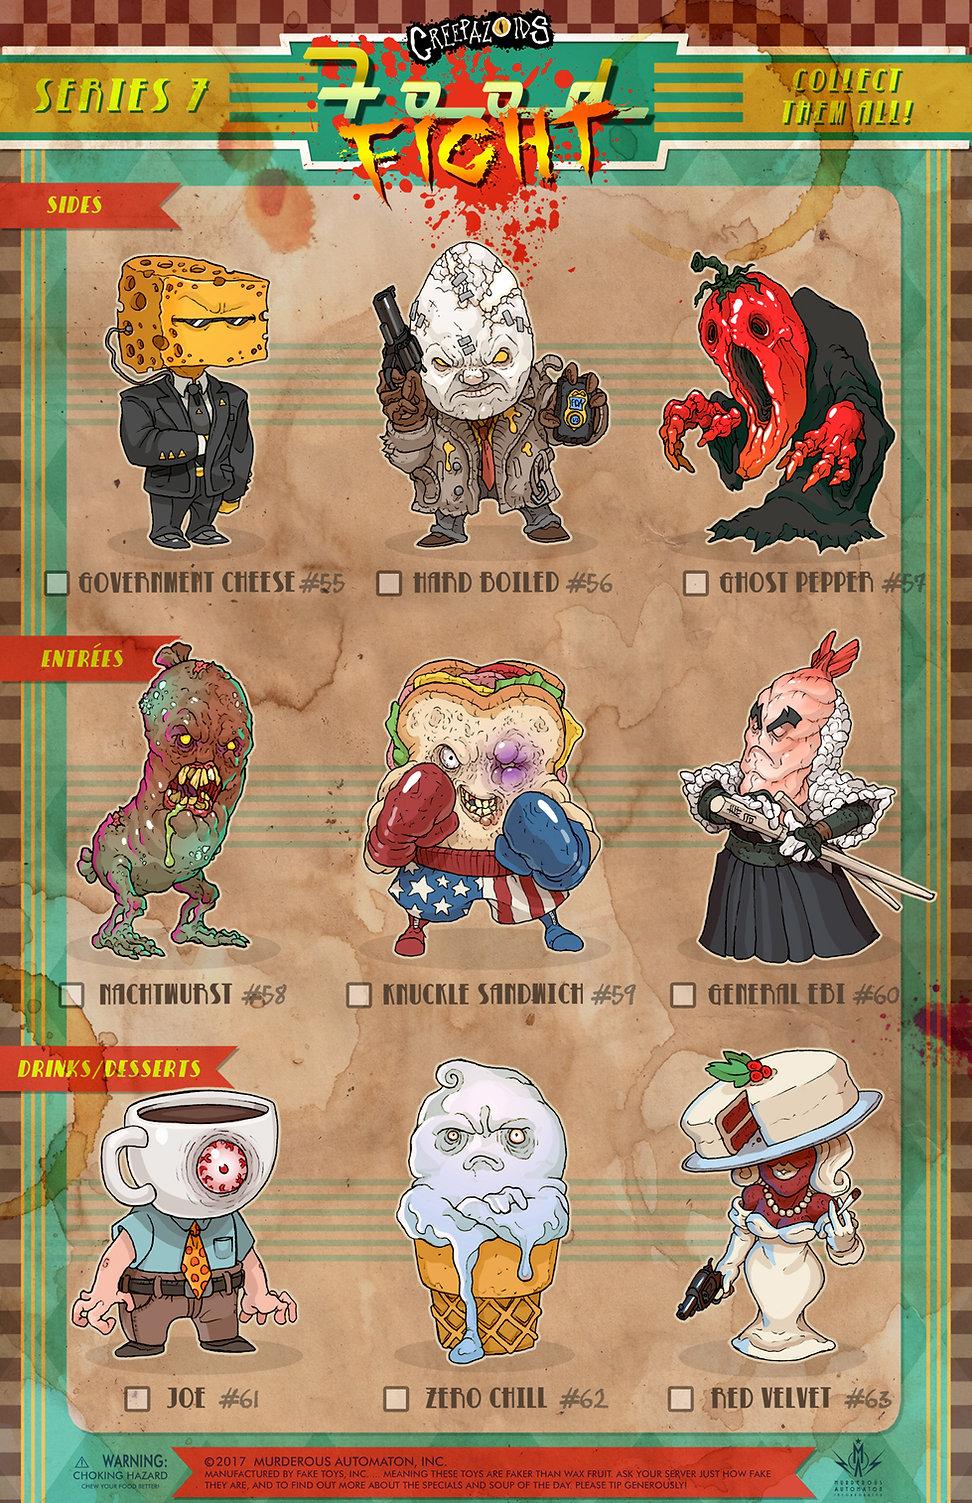 07 Creepazoids--Food Fight.jpg